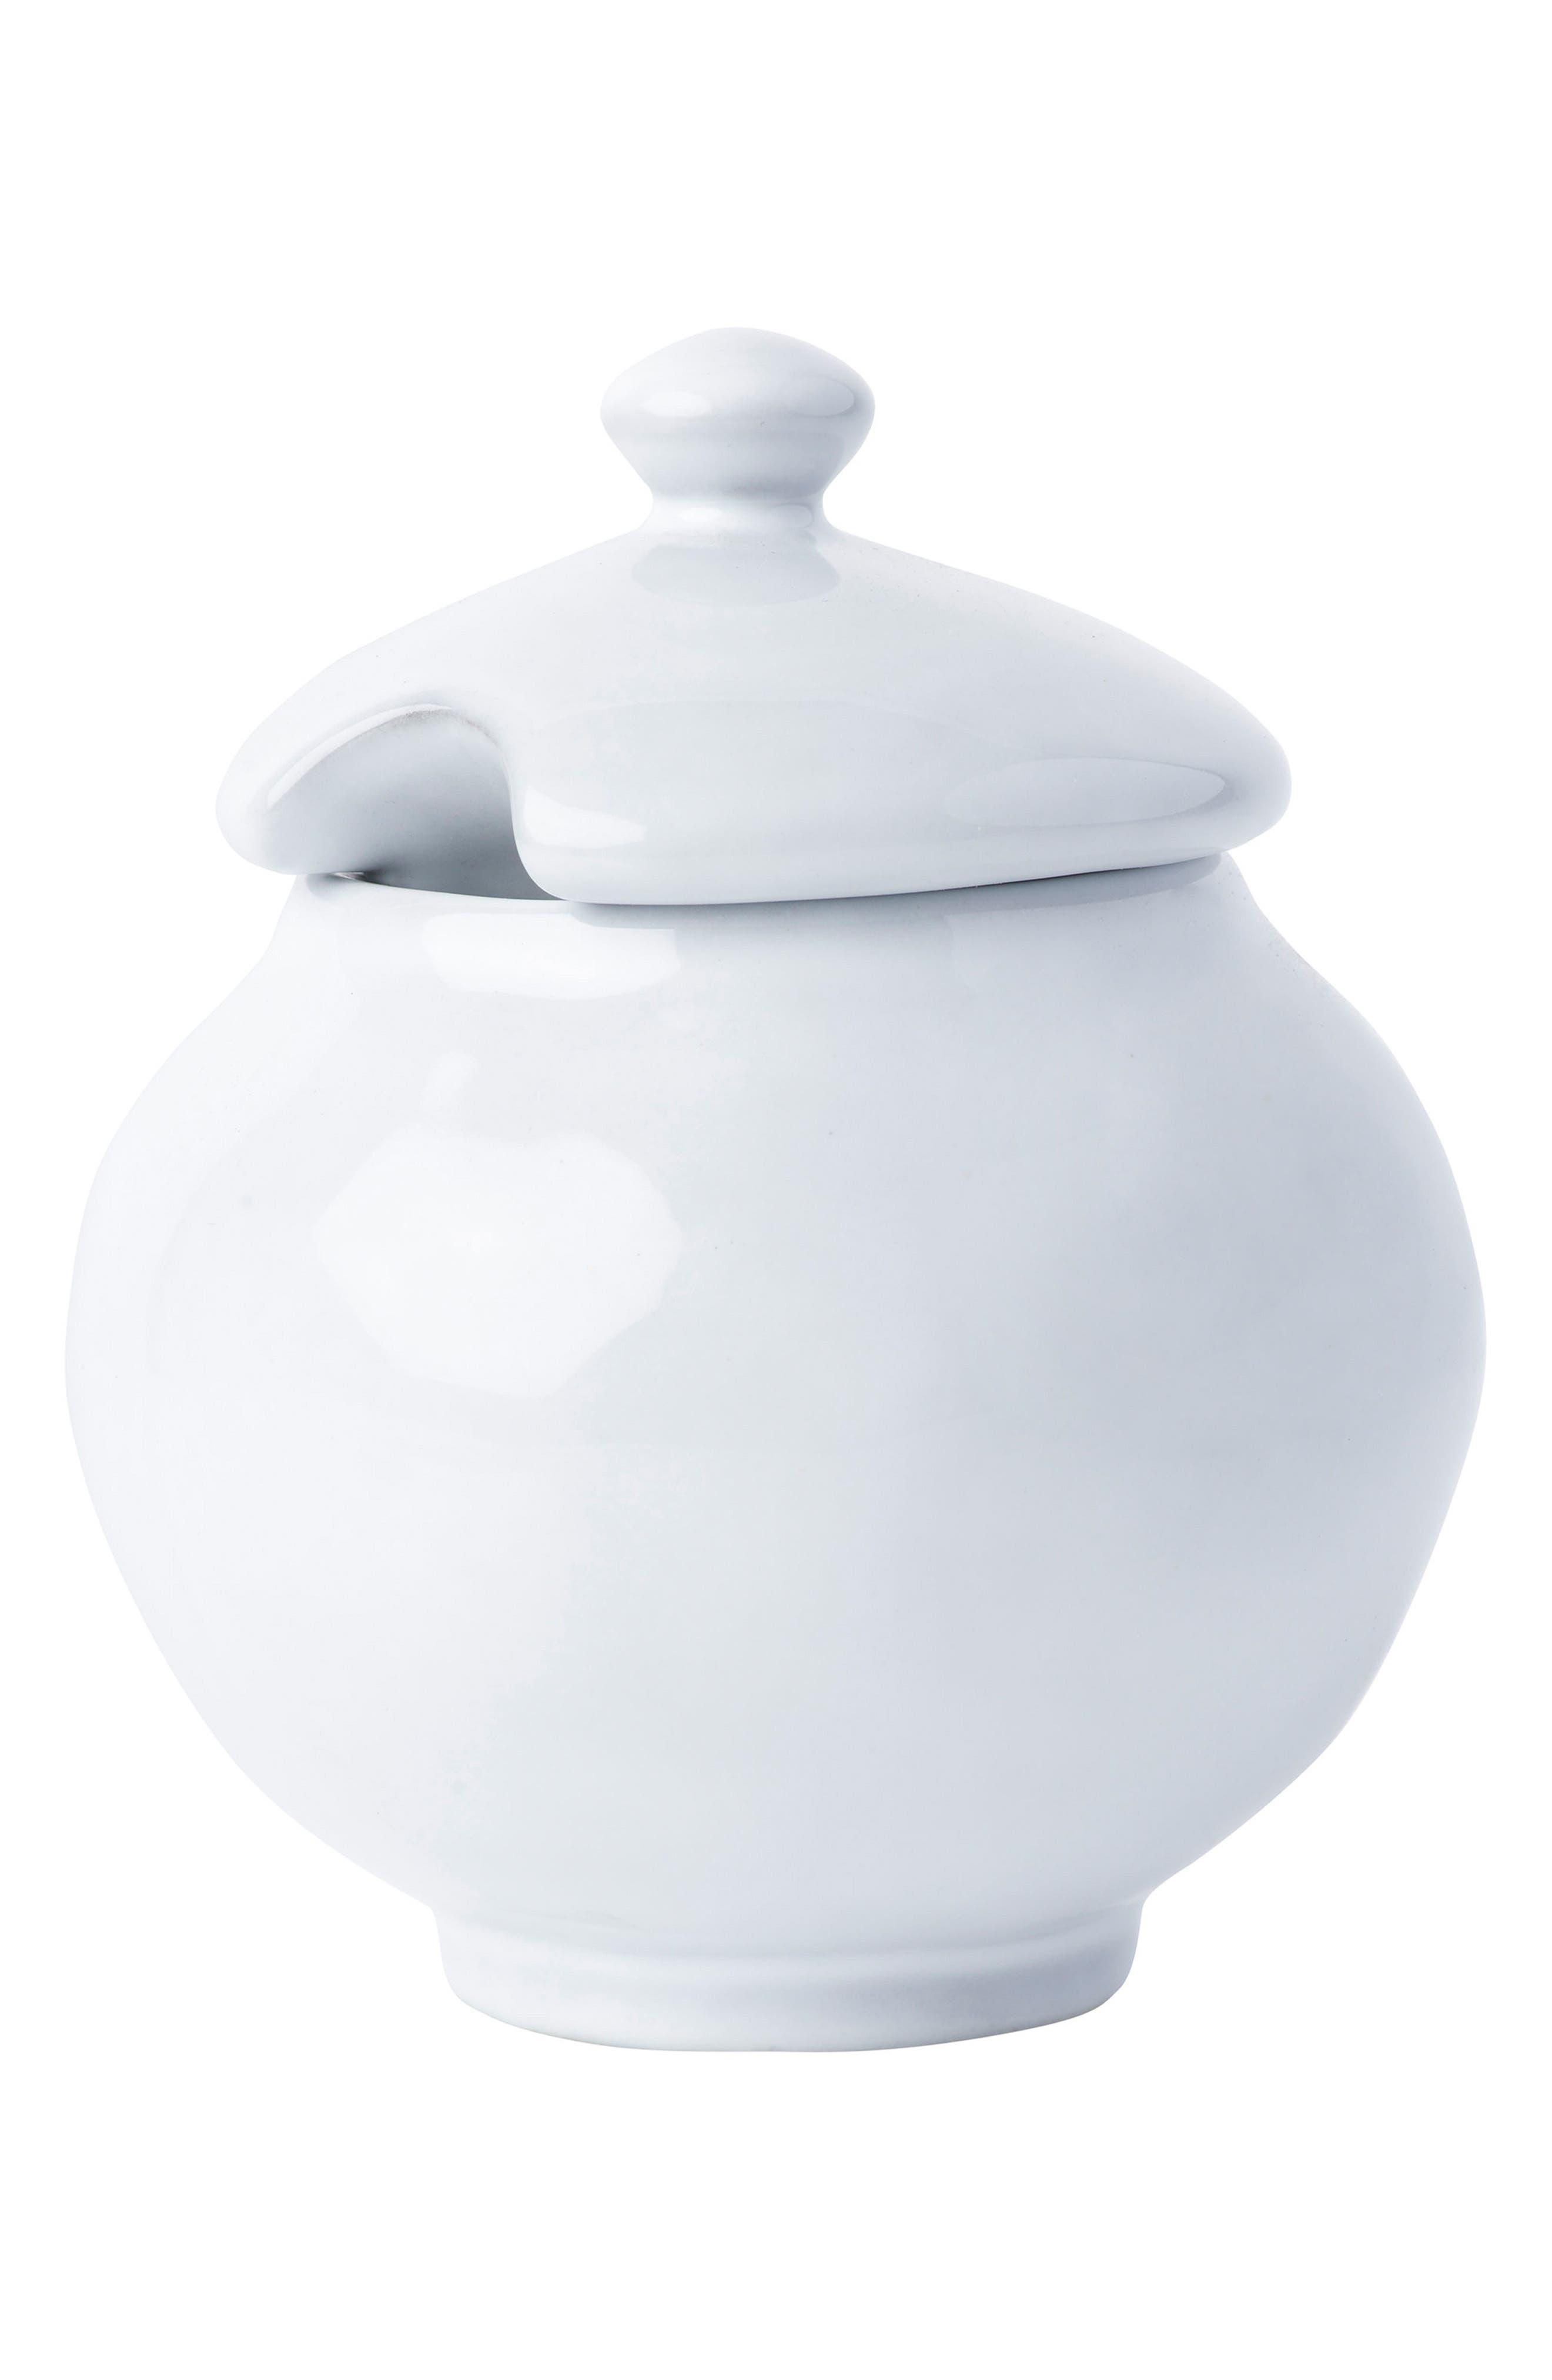 Quotidien White Truffle Ceramic Sugar Bowl,                             Main thumbnail 1, color,                             WHITE TRUFFLE